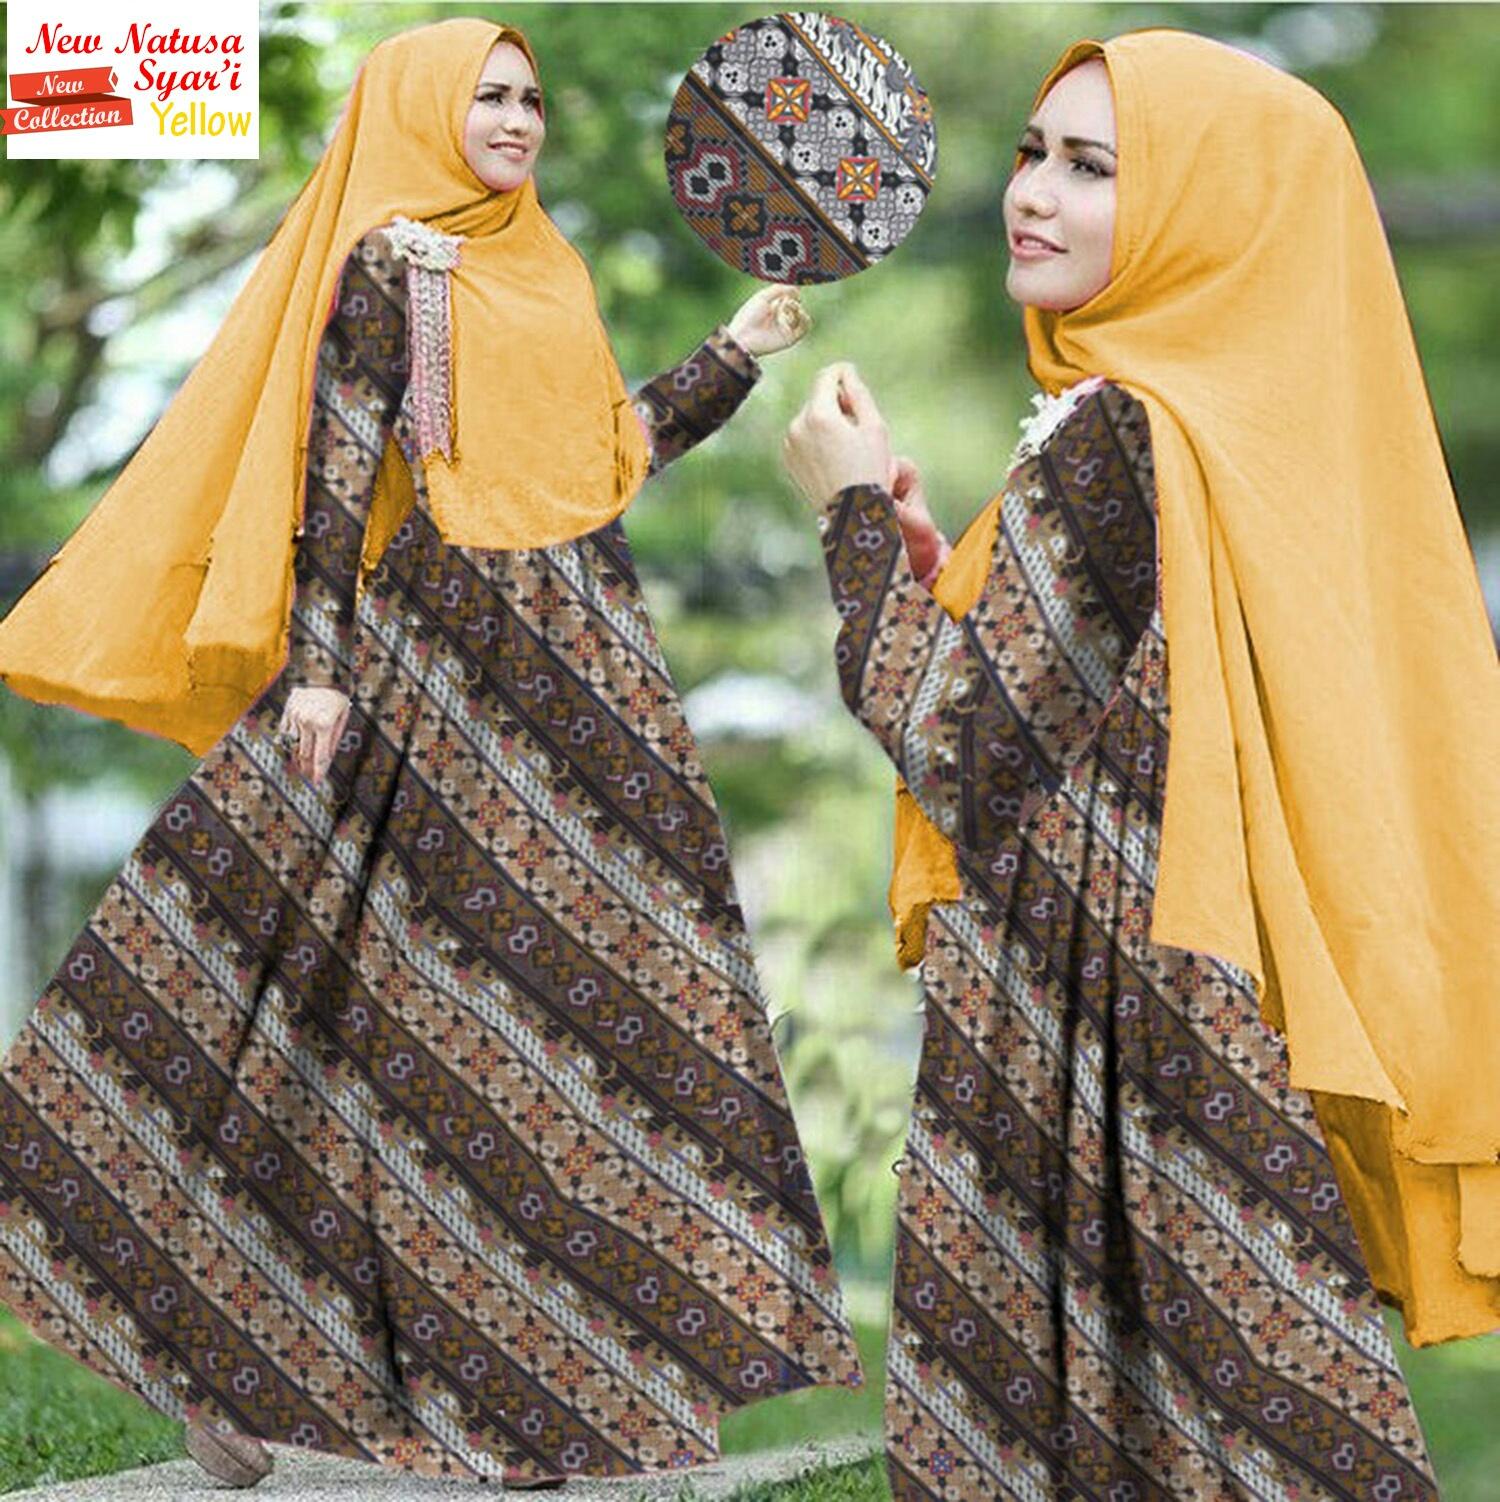 Baju Gamis Syari Motif Bunga Setelan Hijab Jilbab Bergo Modern